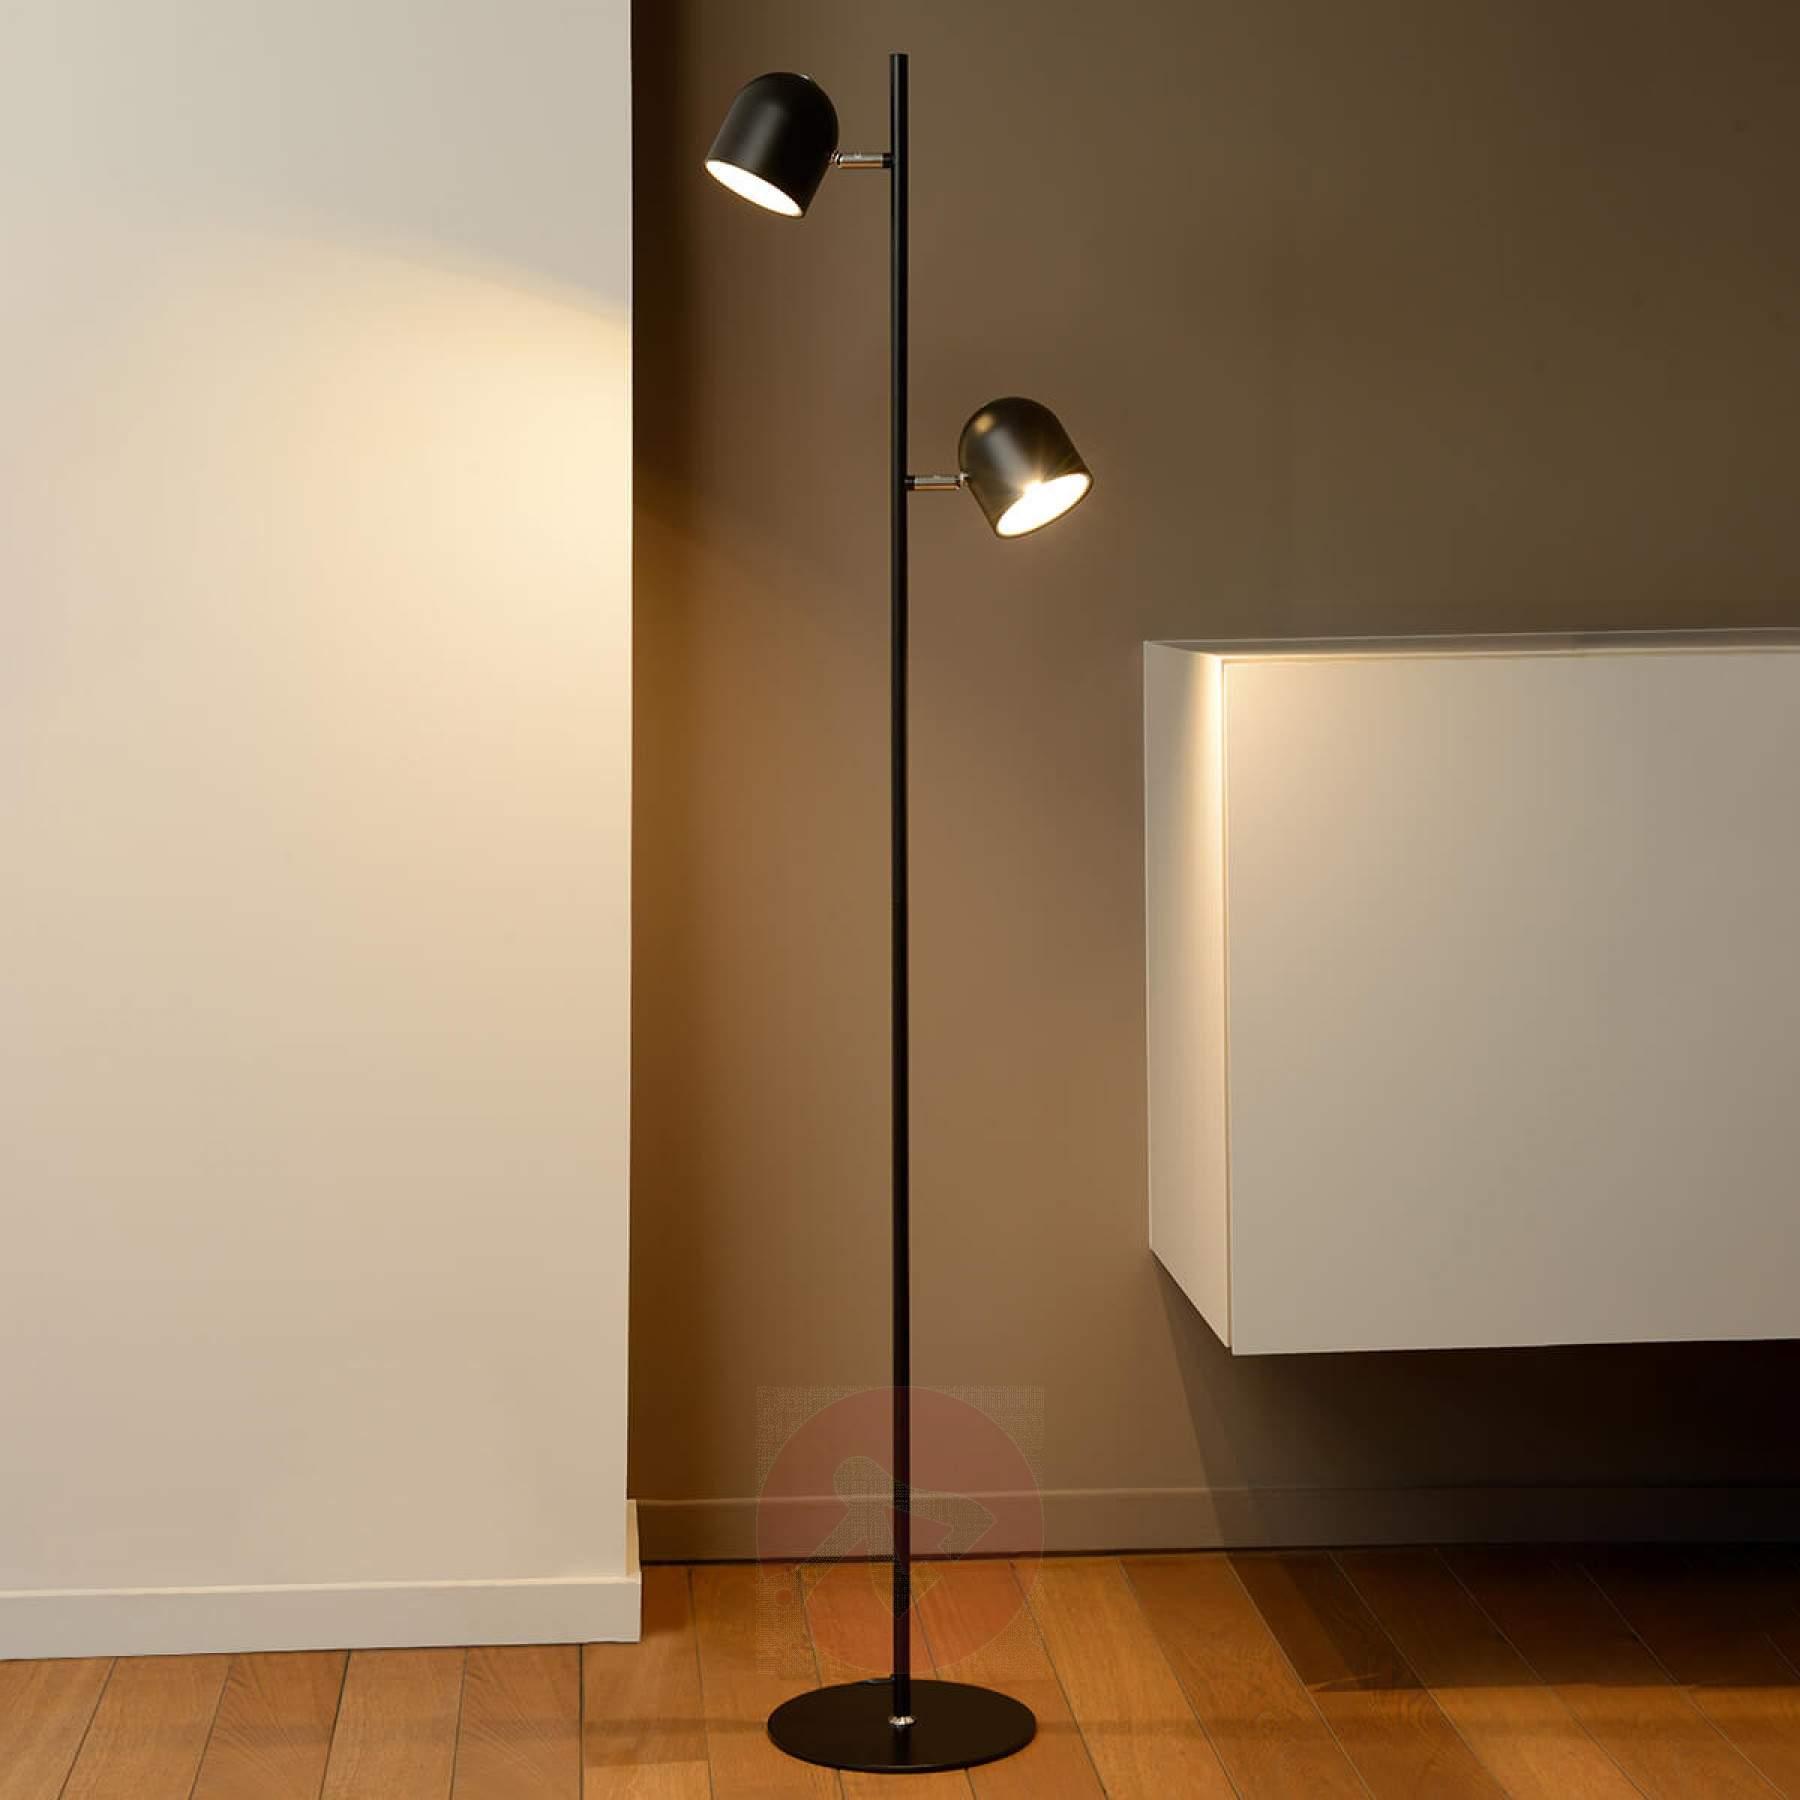 Full Size of Dimmbare Led Stehleuchte Skanska In Schwarz Kaufen Lampenweltde Stehlampe Schlafzimmer Wohnzimmer Stehlampen Wohnzimmer Stehlampe Dimmbar